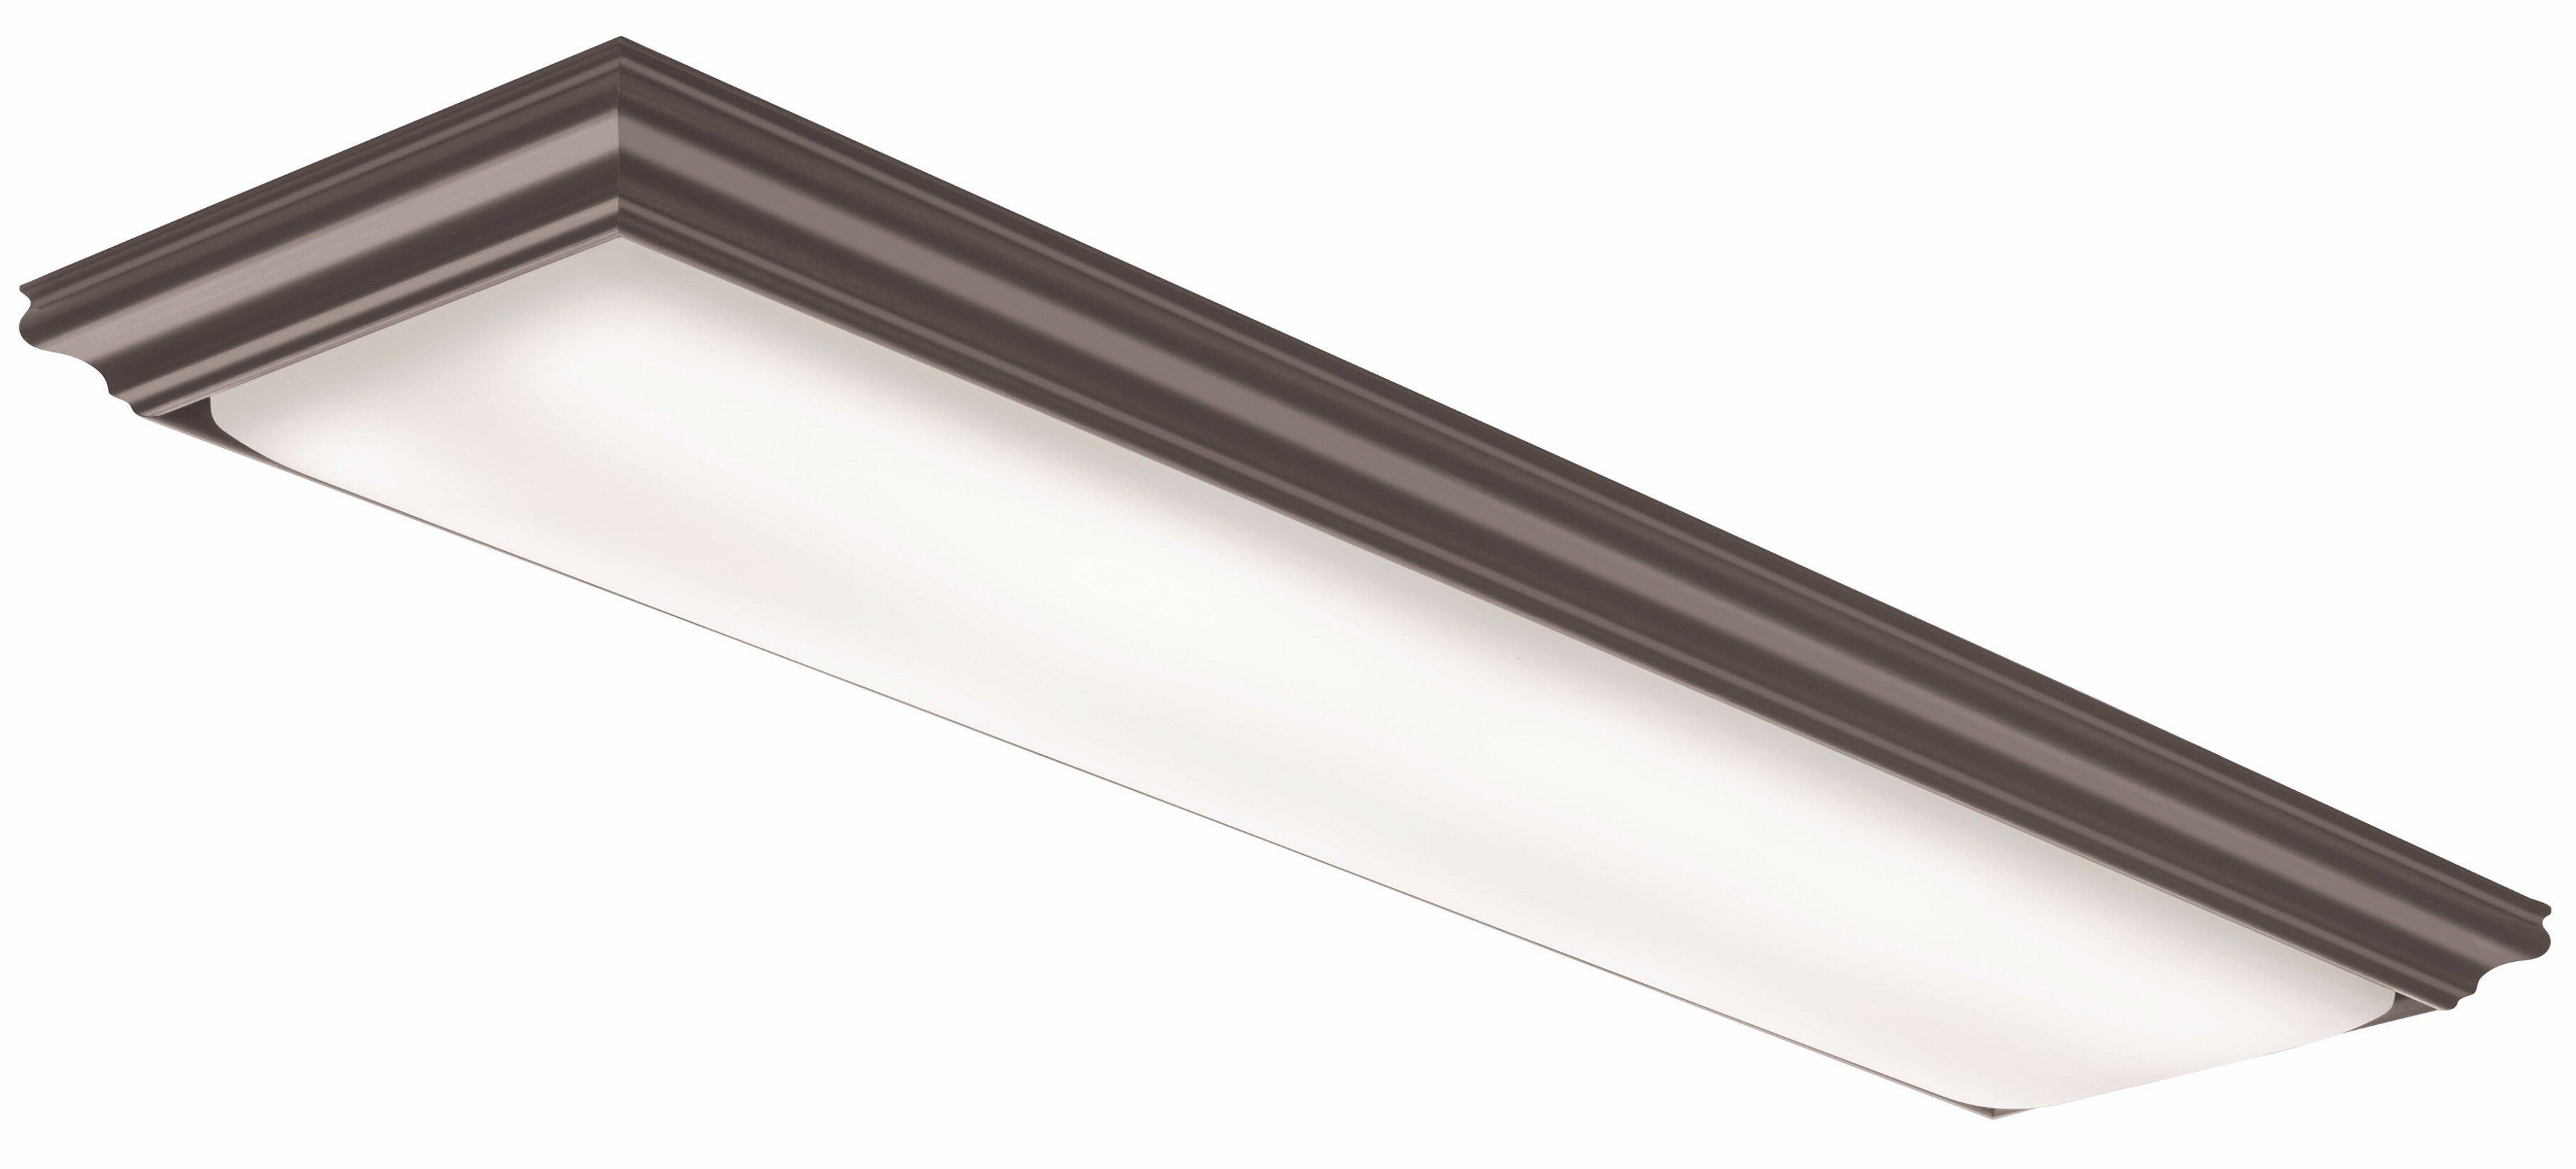 Image of: Lithonia Lighting 1 X 4 Led Flush Mount Reviews Wayfair